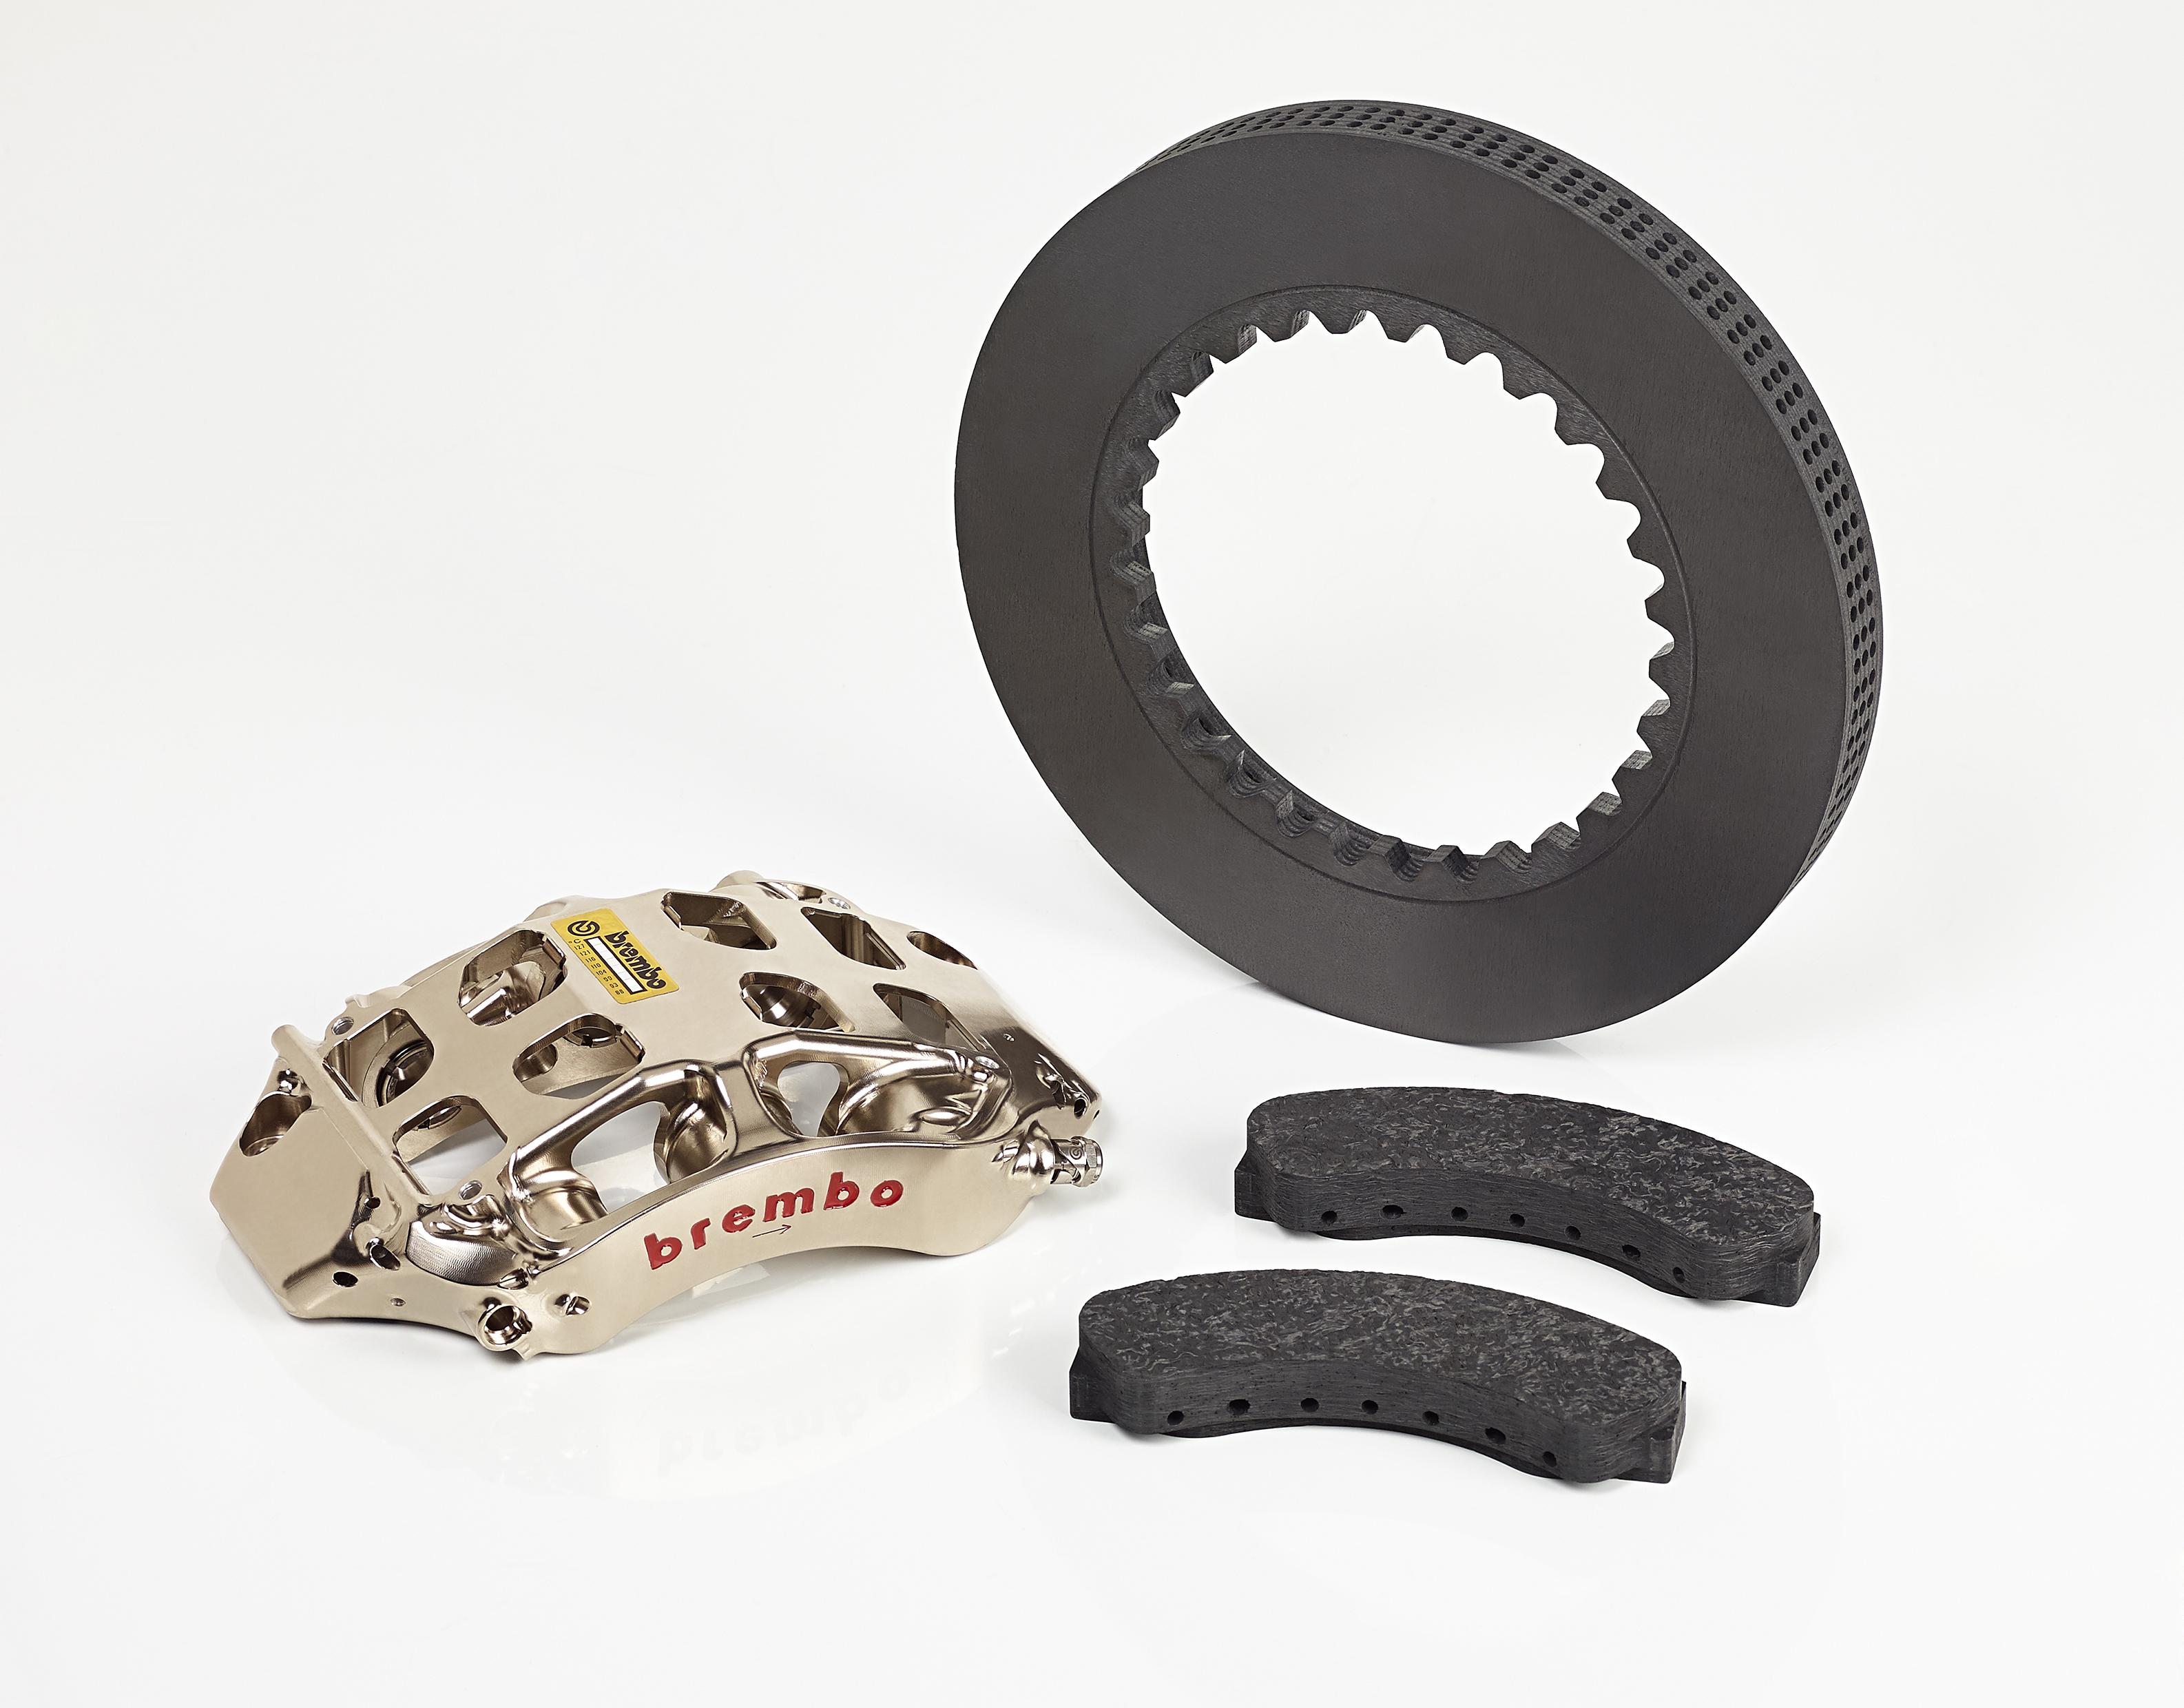 BREMBO F1 brake system components